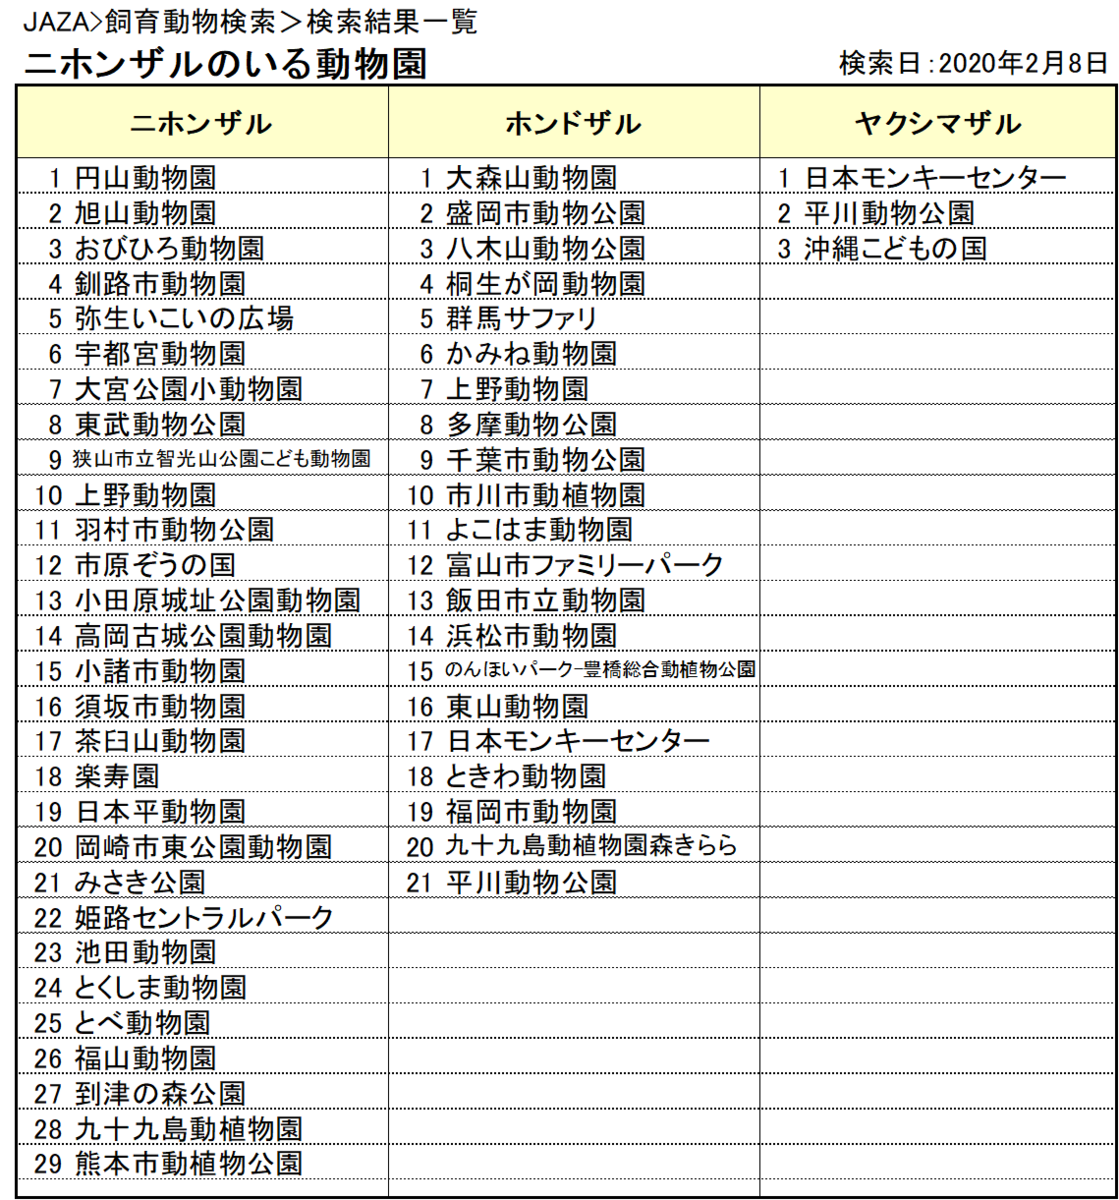 f:id:tsukunepapa:20200210233040p:plain